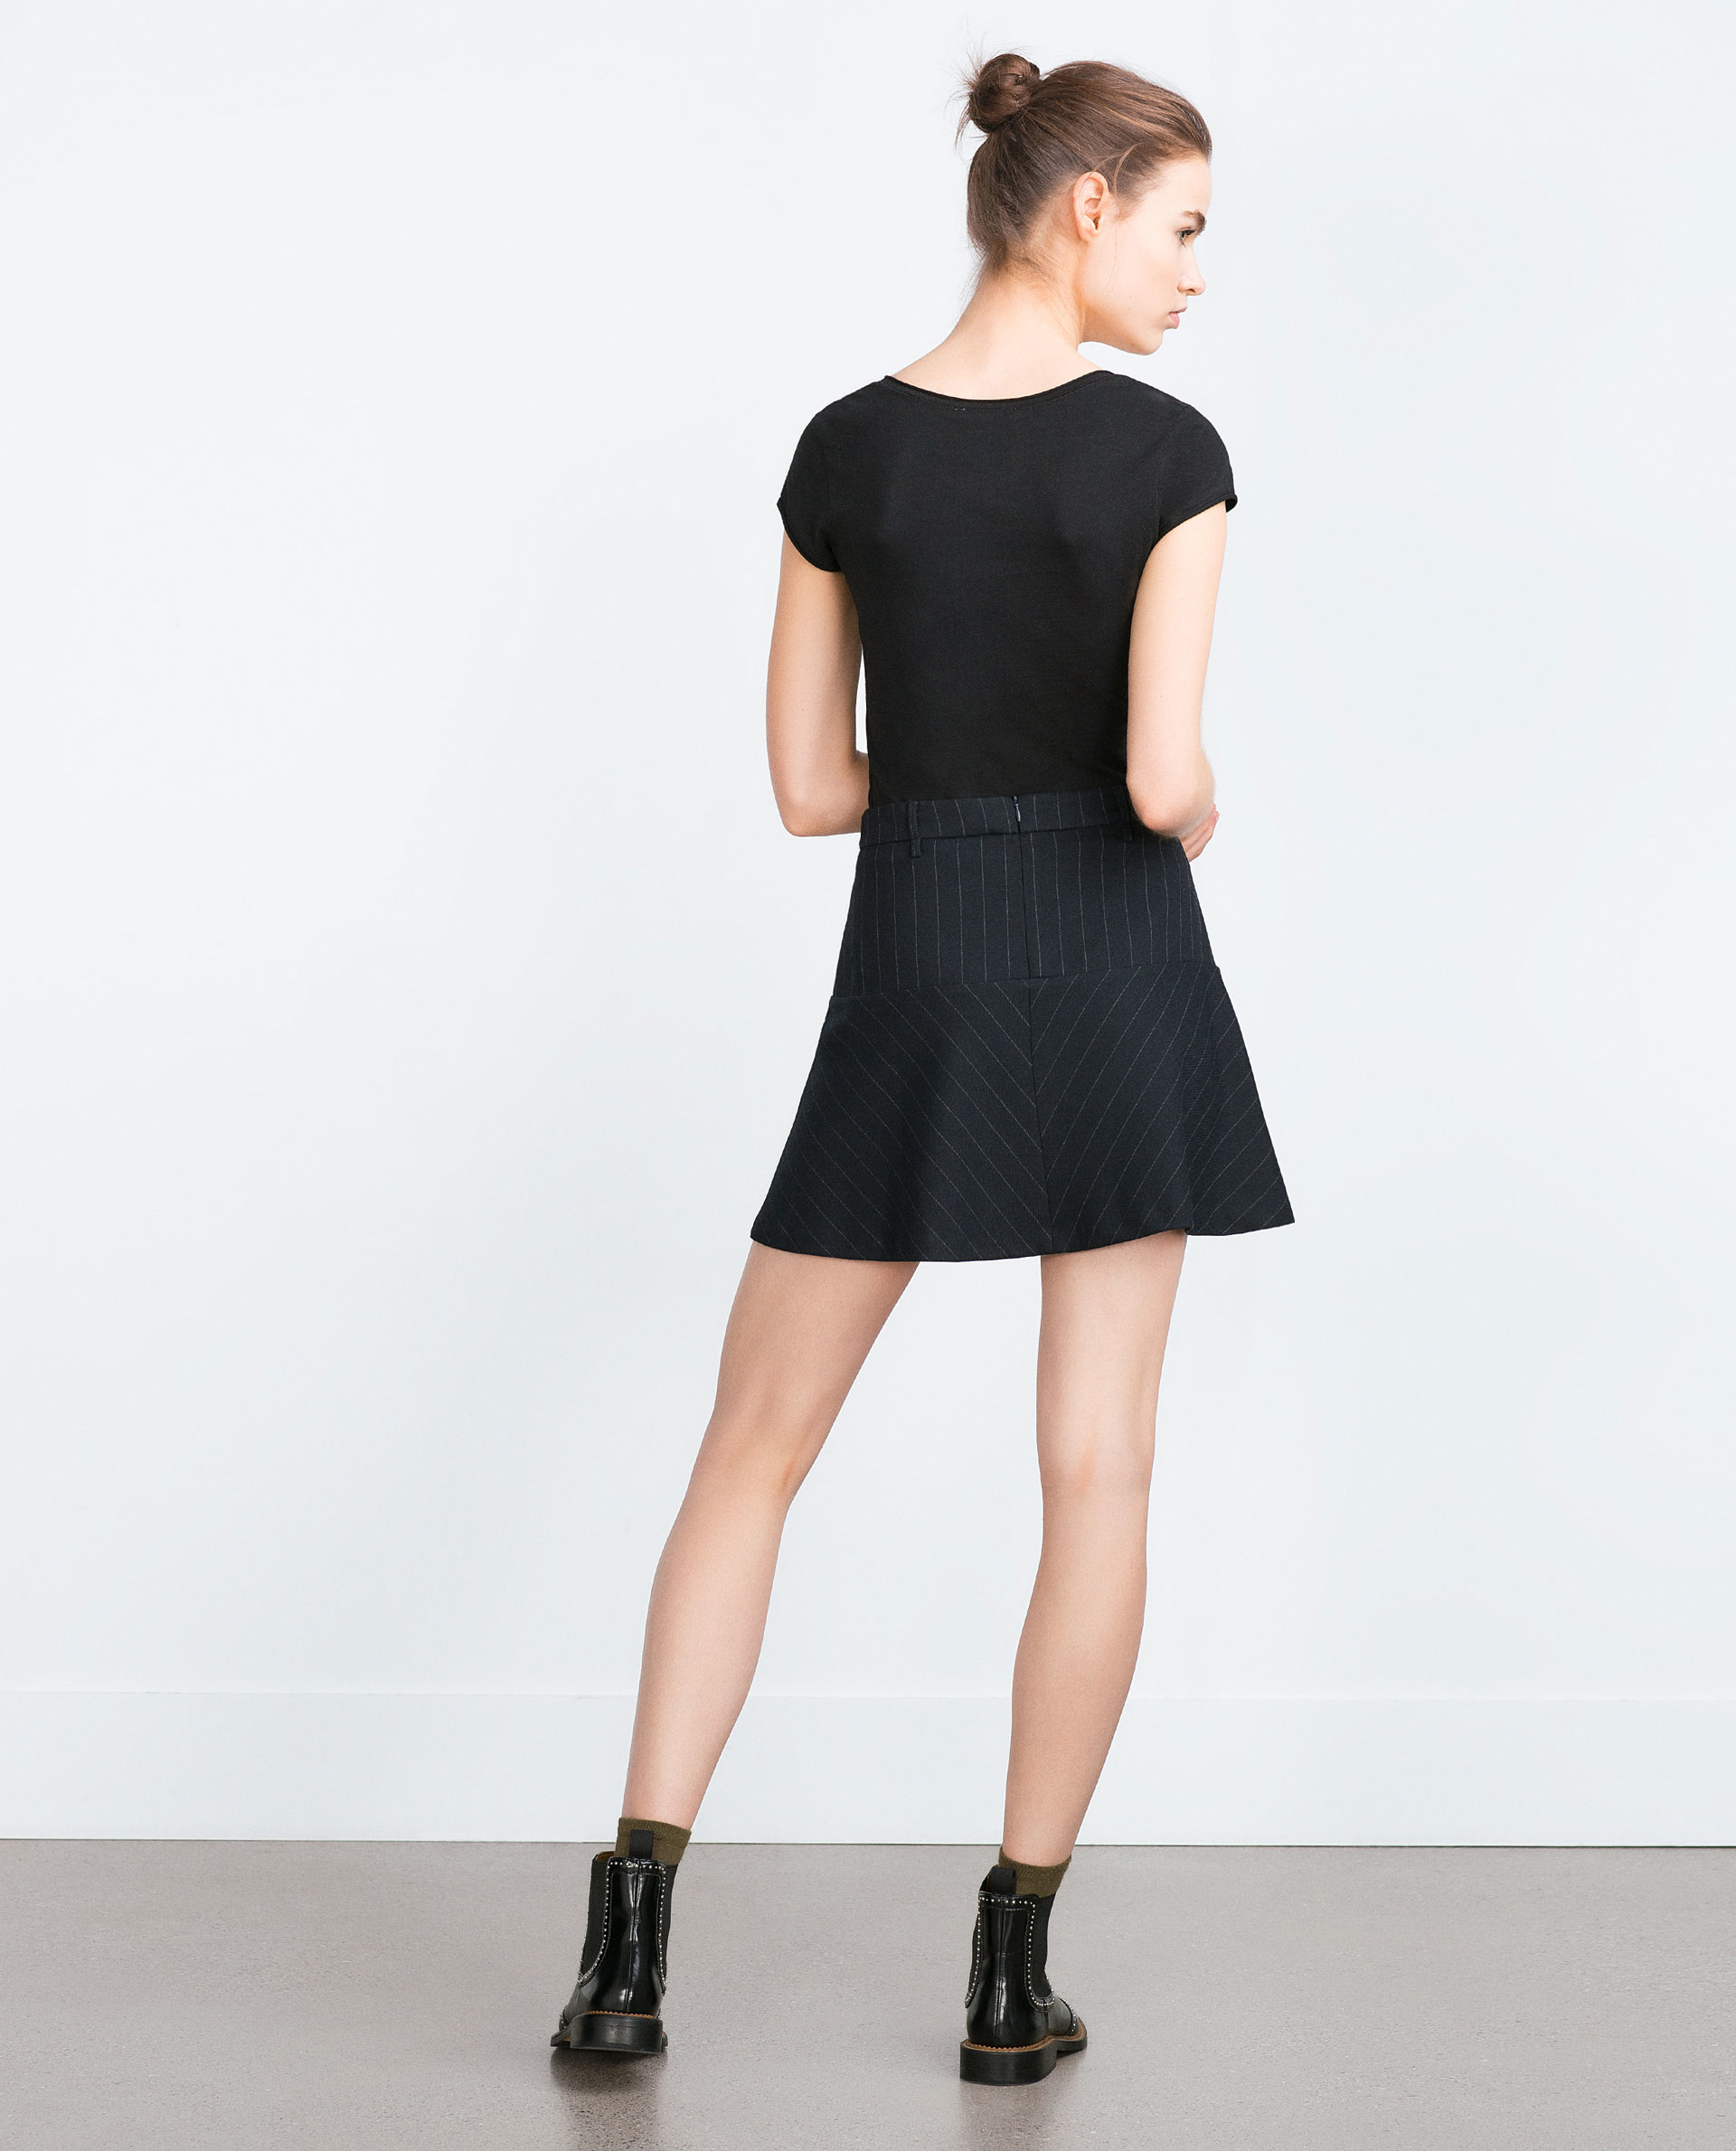 Zara short sleeve t shirt in black lyst for Zara black t shirt dress